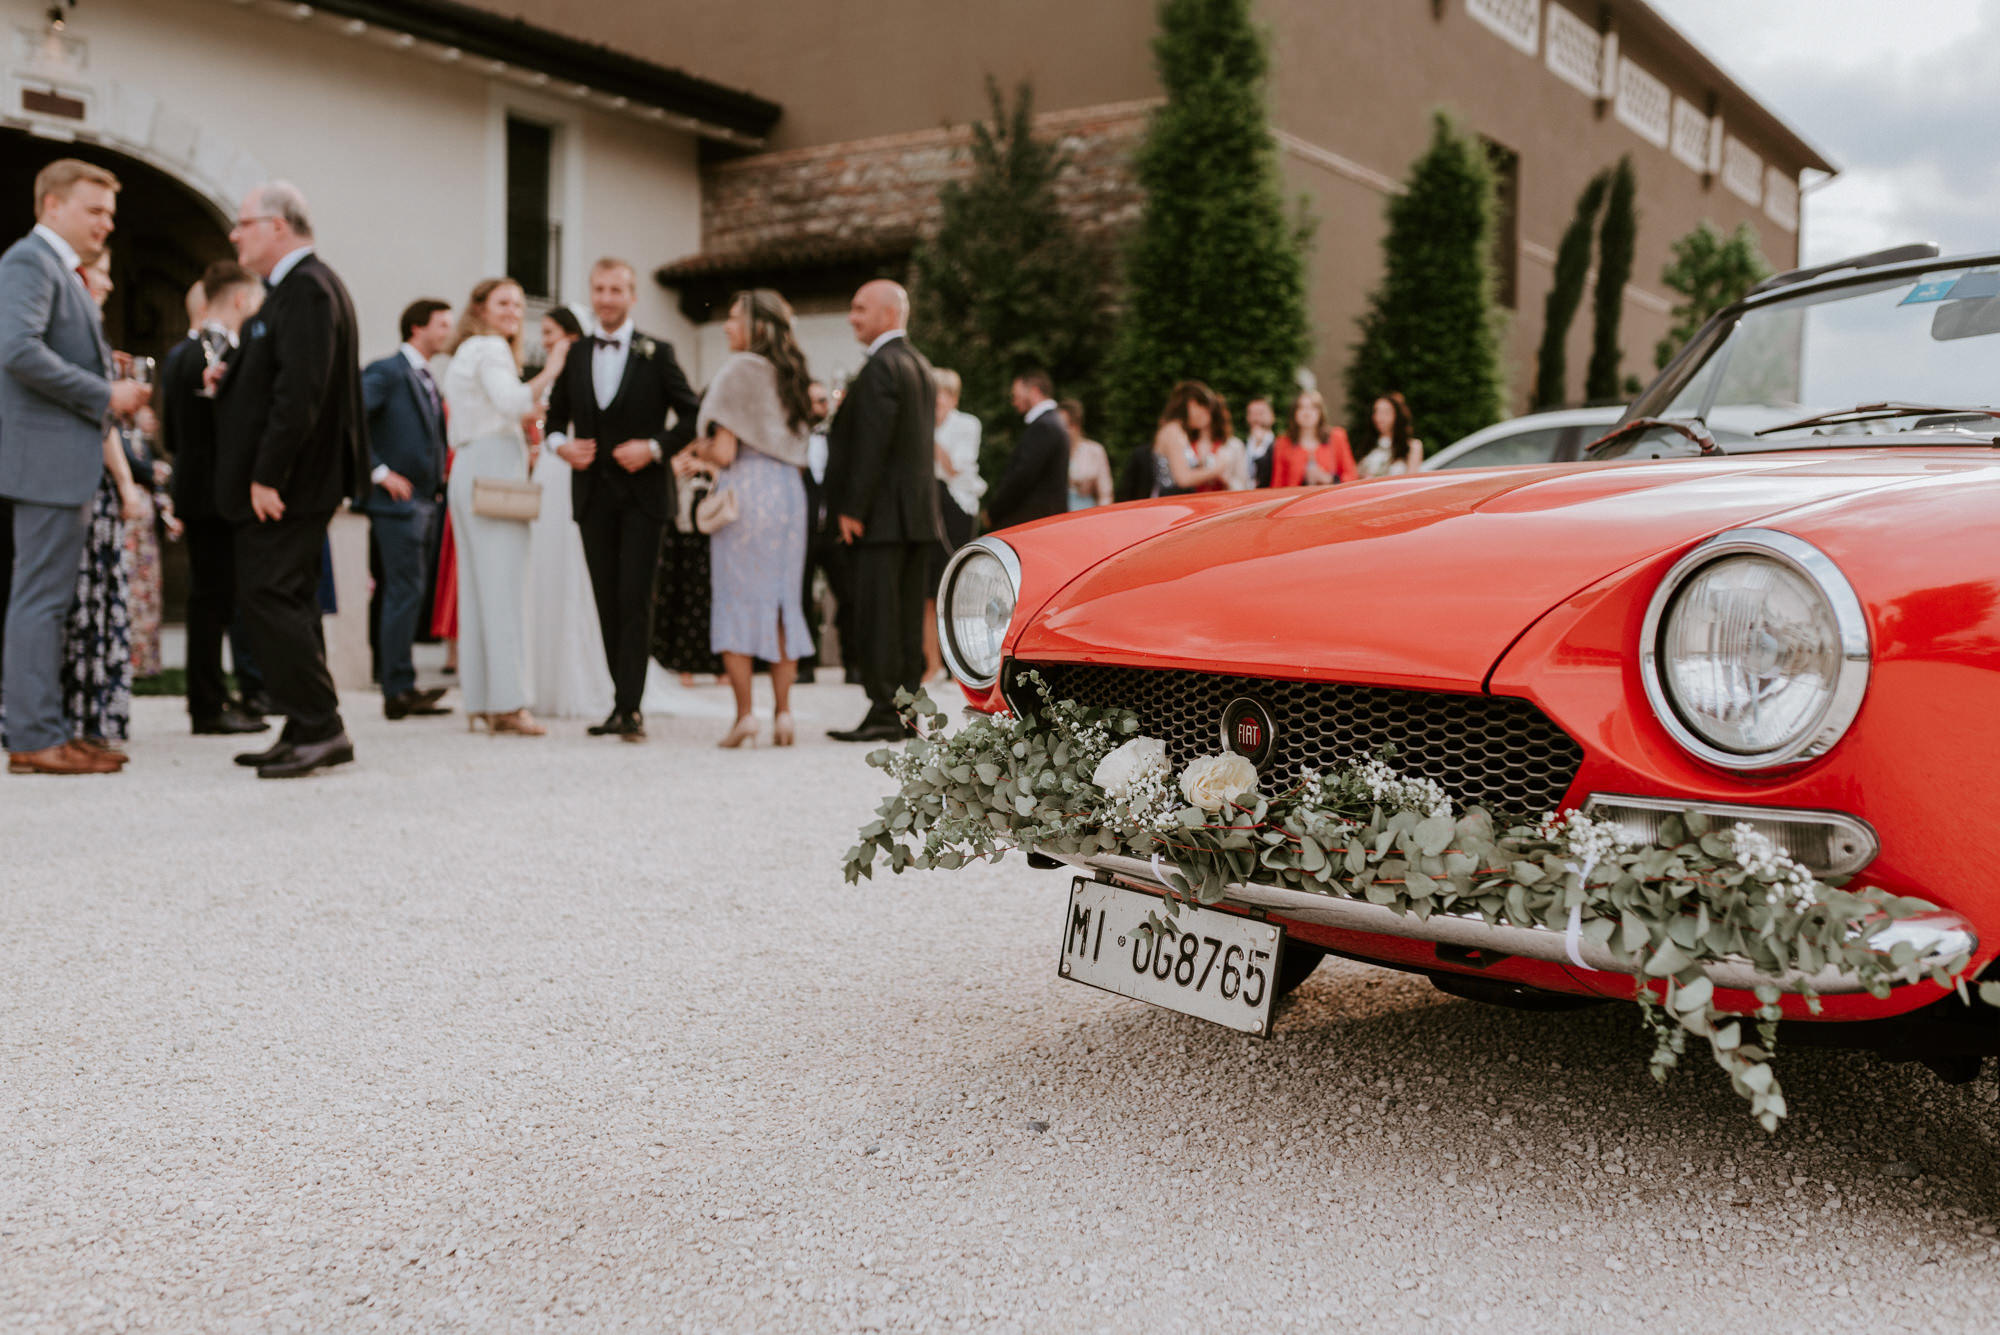 FOTO+PHOTO+BODA+WEDDING+ITALIA+ITALY+MAURICIO+GARAY+MAURICIOGARAY+WEDDINPHOTOGRAPHER+FOTOGRAFODEBODA-1397.jpg